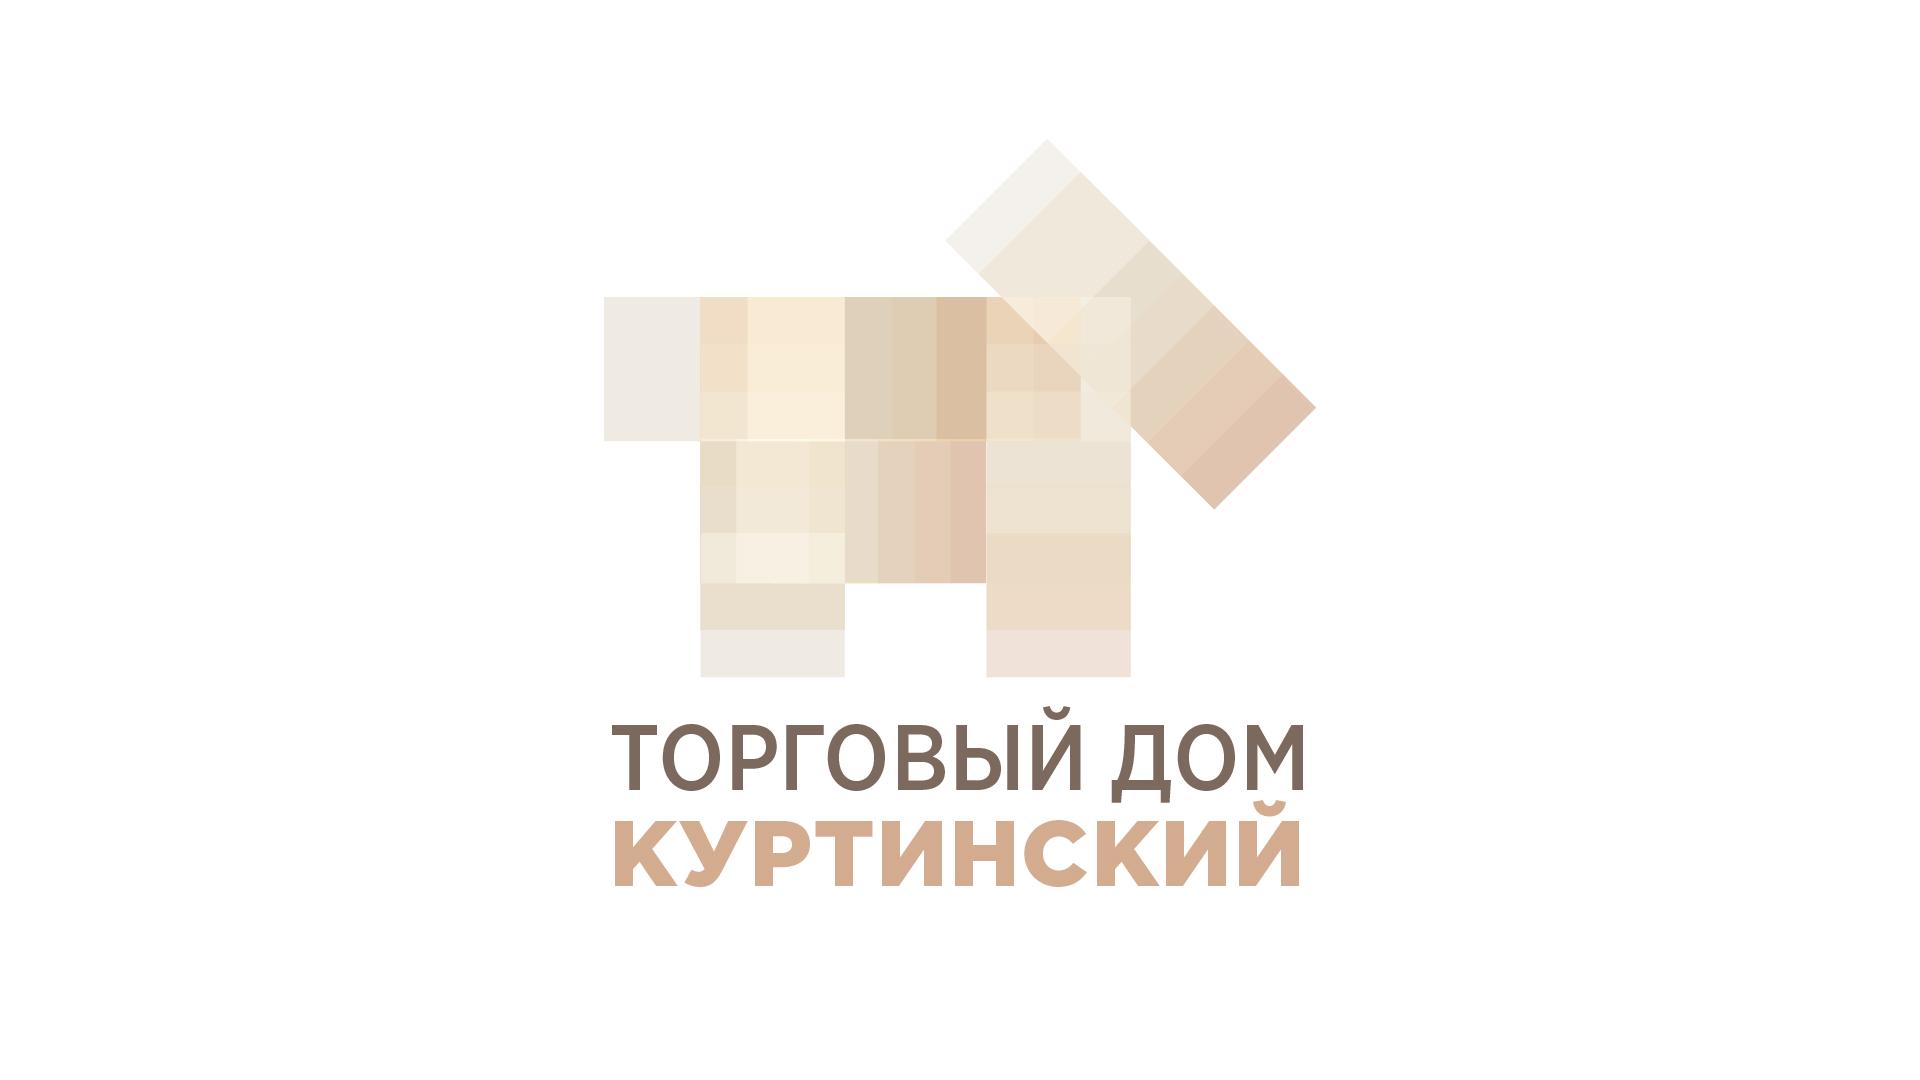 Логотип для камнедобывающей компании фото f_6125b992a68c88f5.jpg